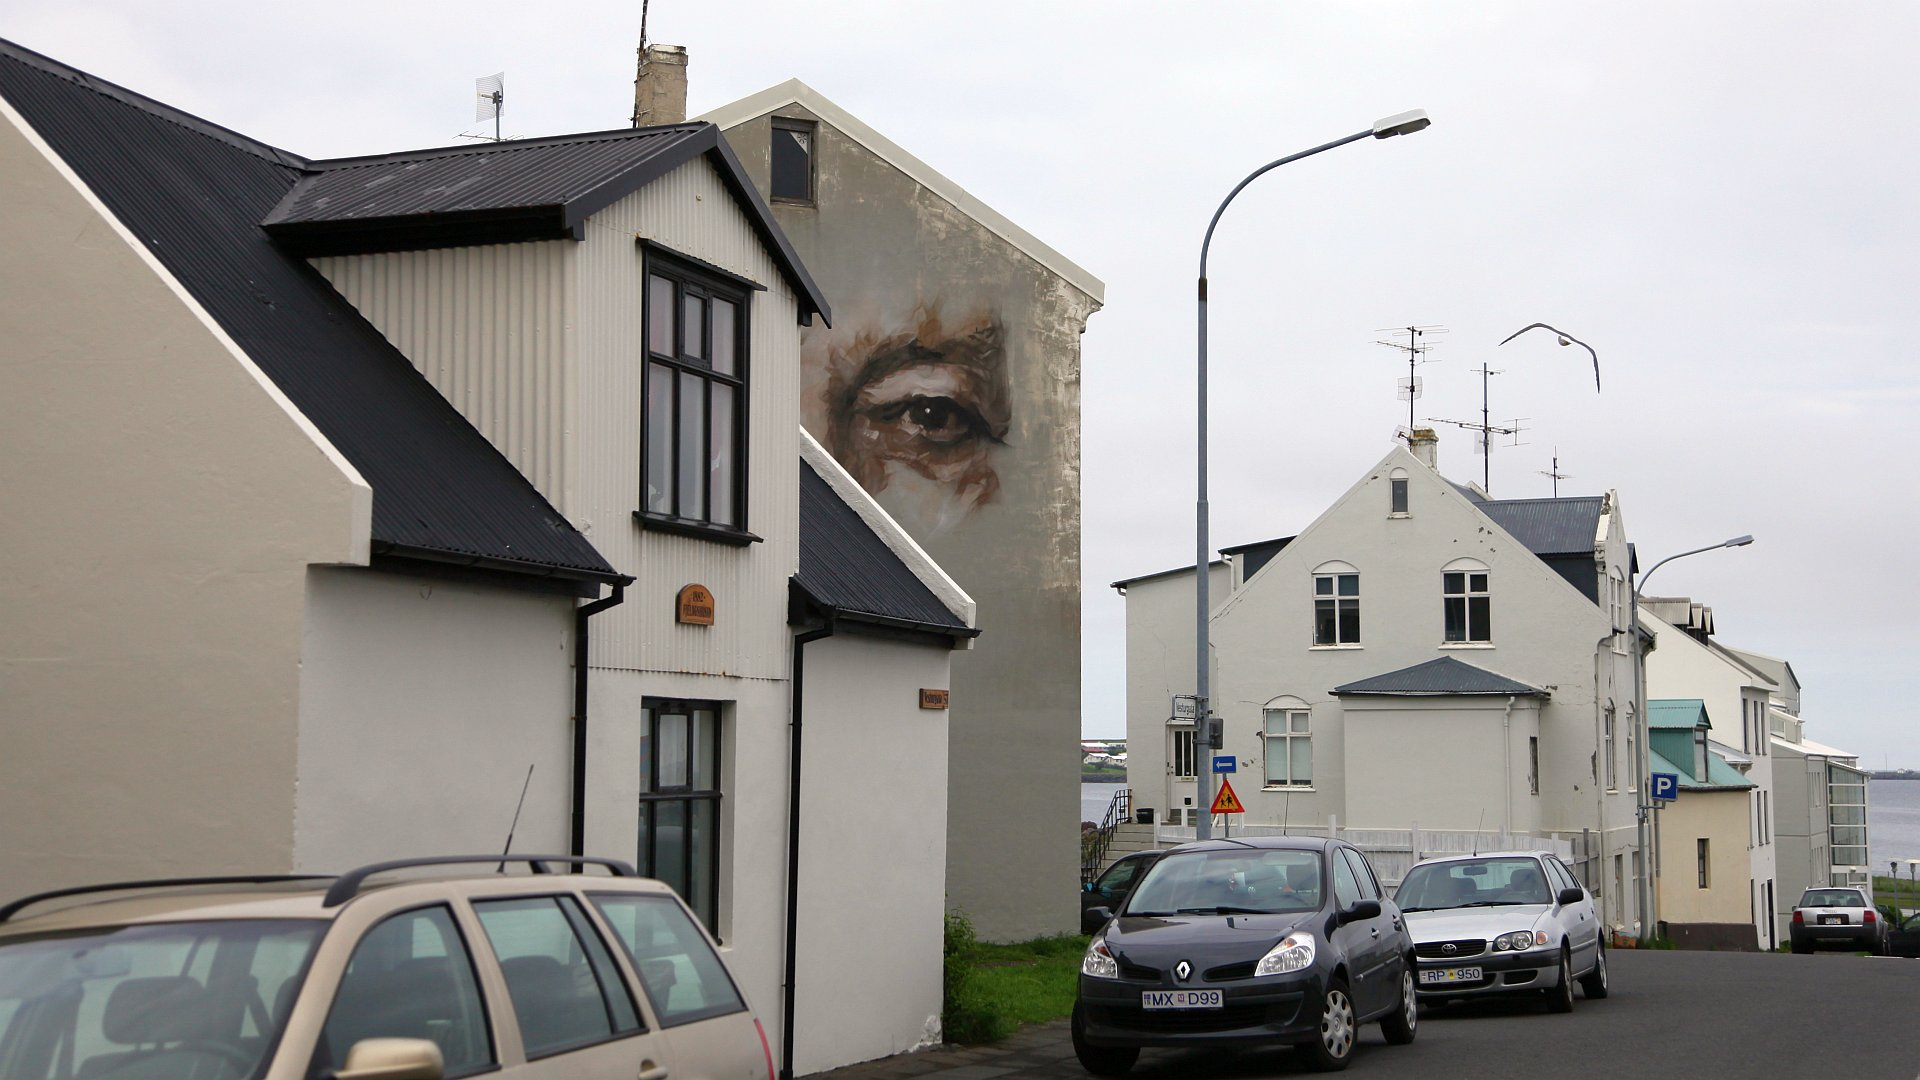 walls have eyes